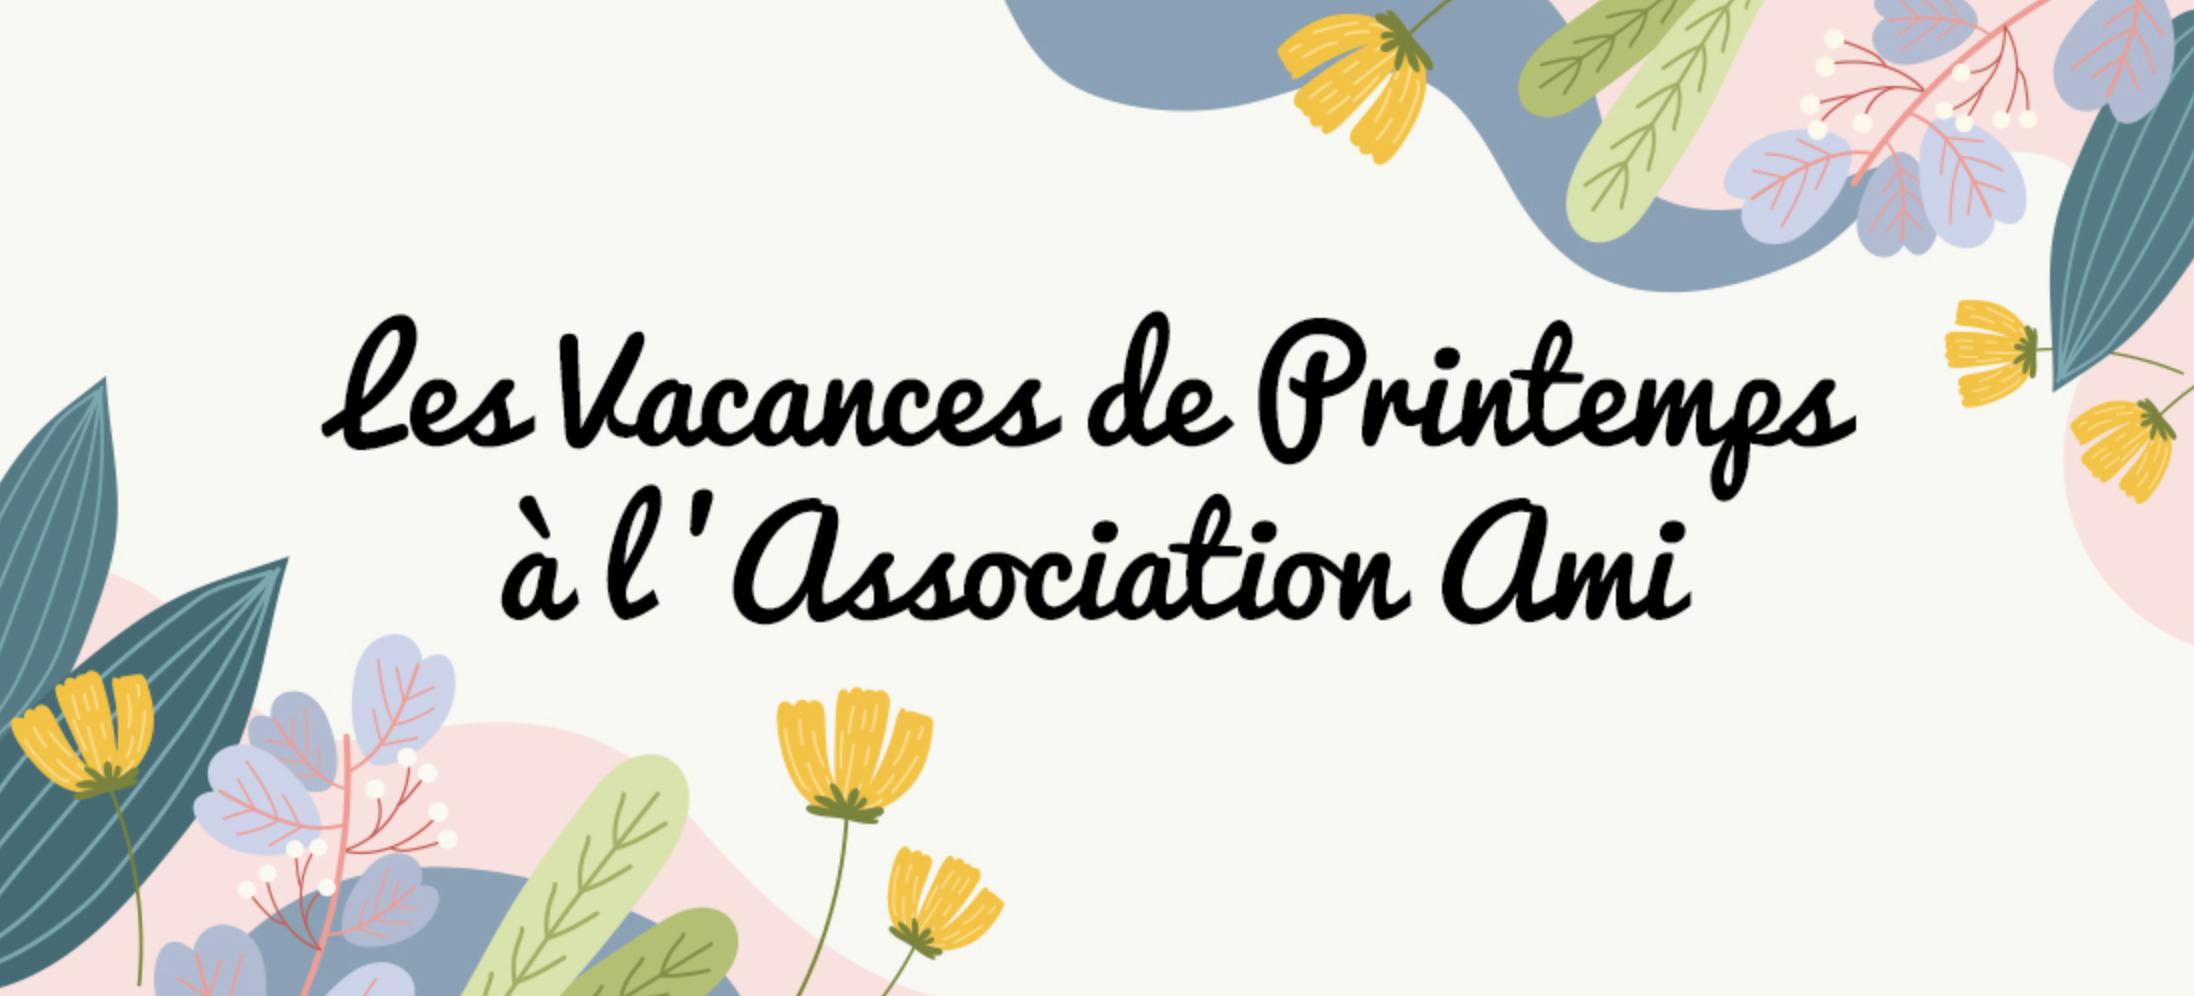 Les Vacances de printemps à l'Association AMI